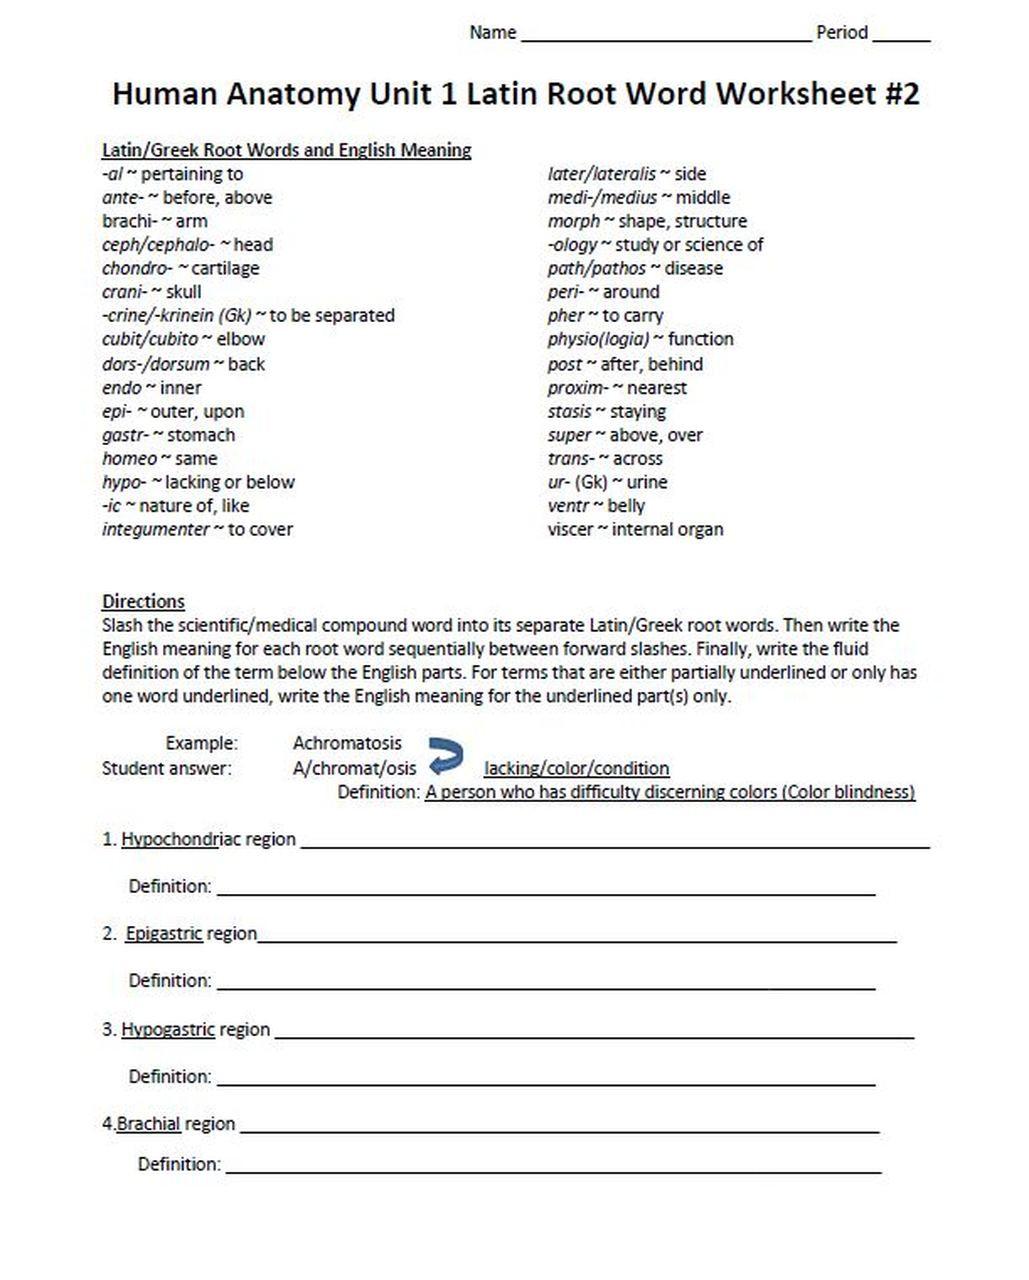 Root Words Worksheet Pdf Latin Root Word Worksheet Set for Unit E Human Anatomy & Physiology